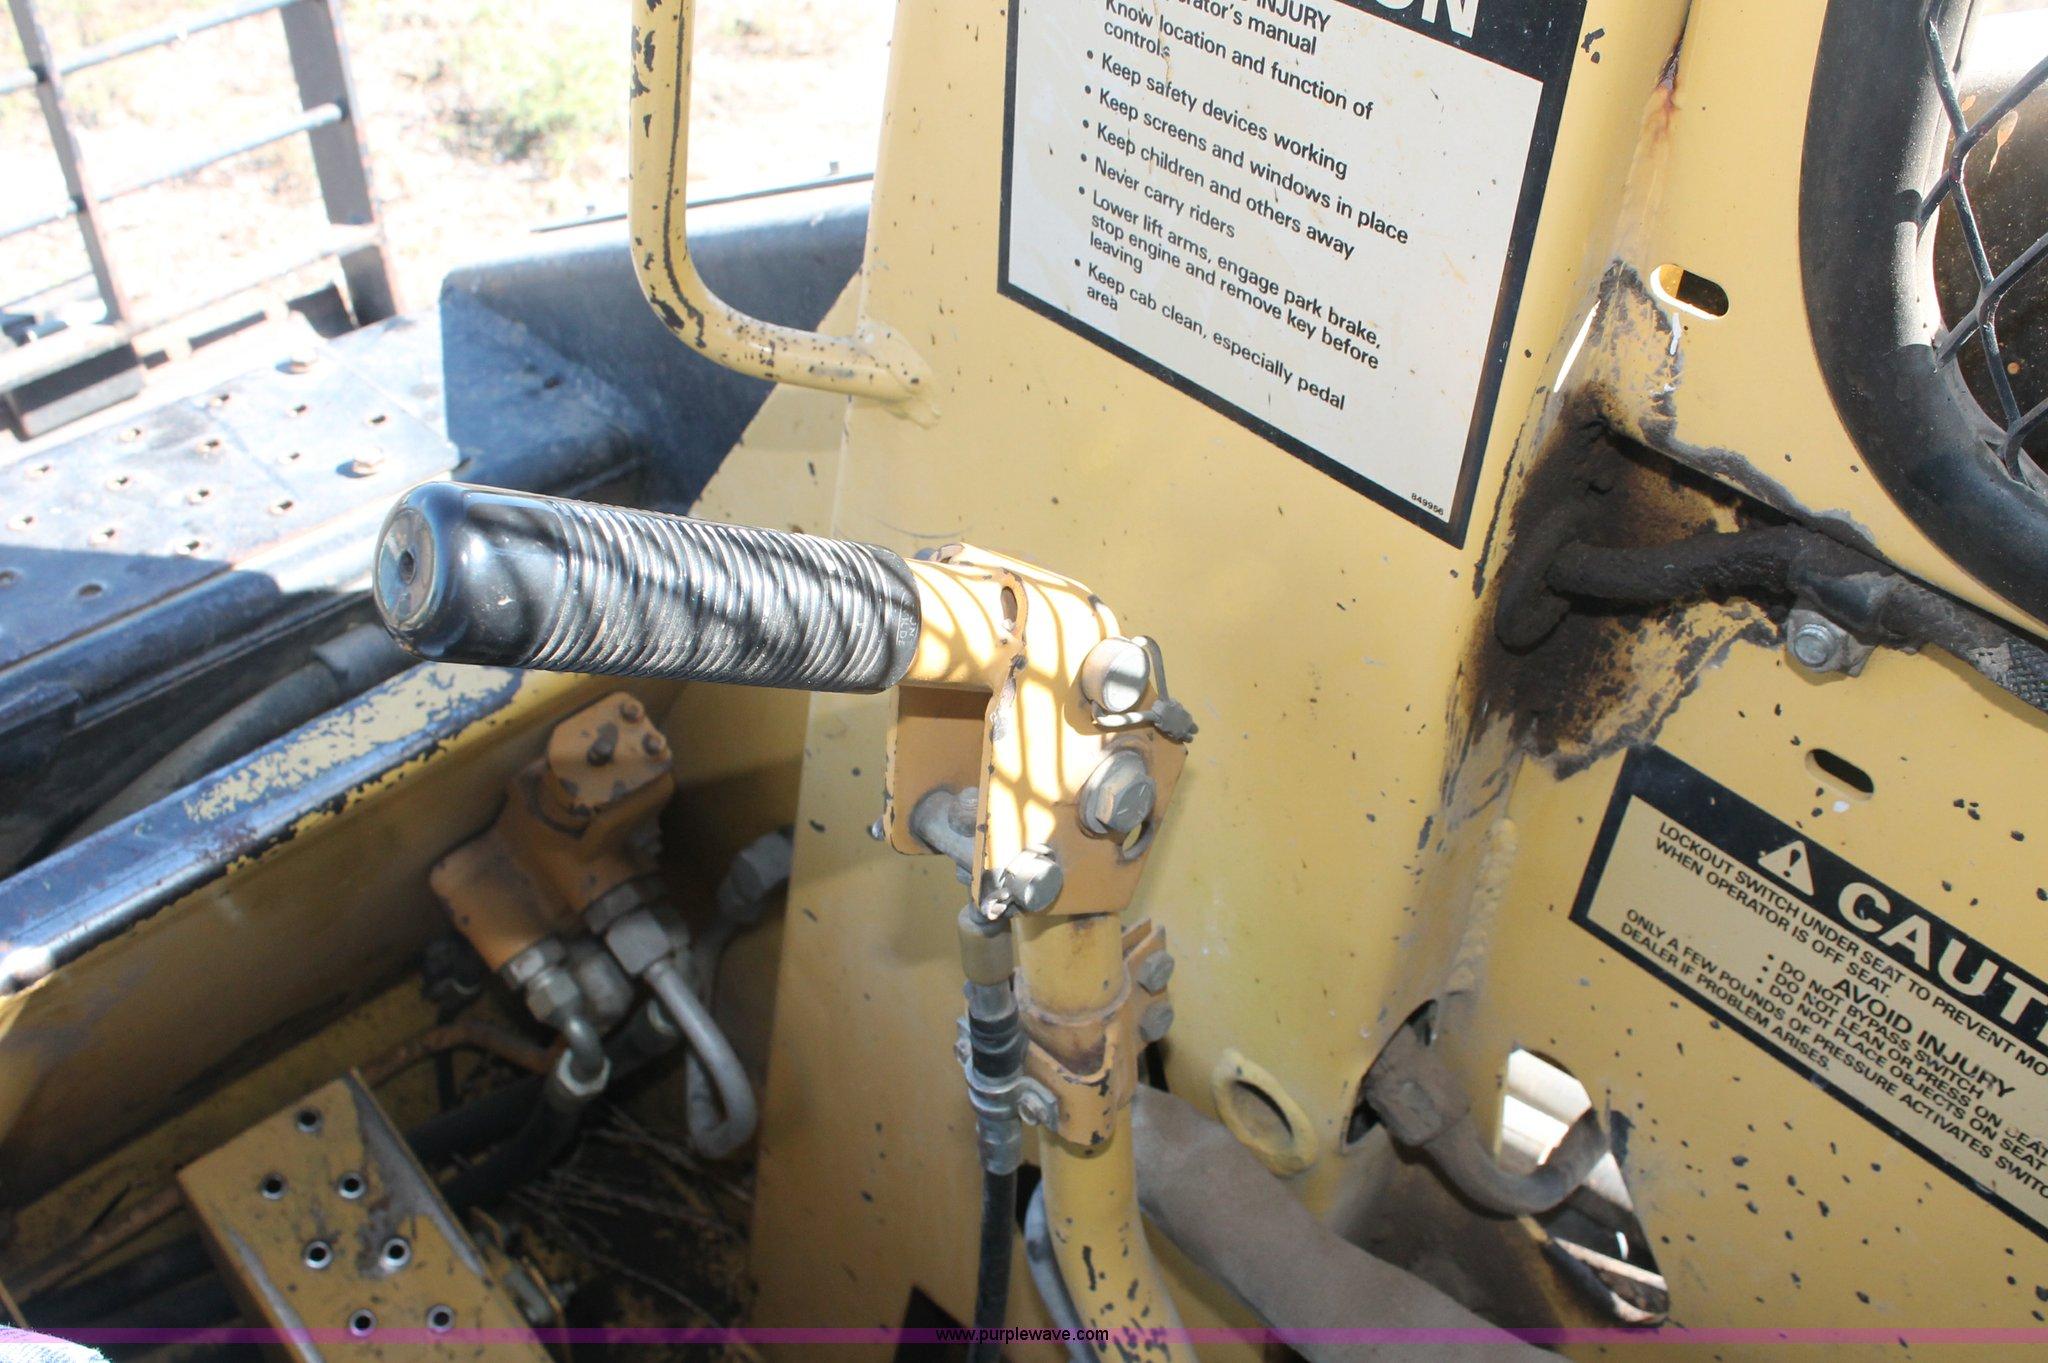 1988 New Holland L553 skid steer | Item F6137 | SOLD! Wednes